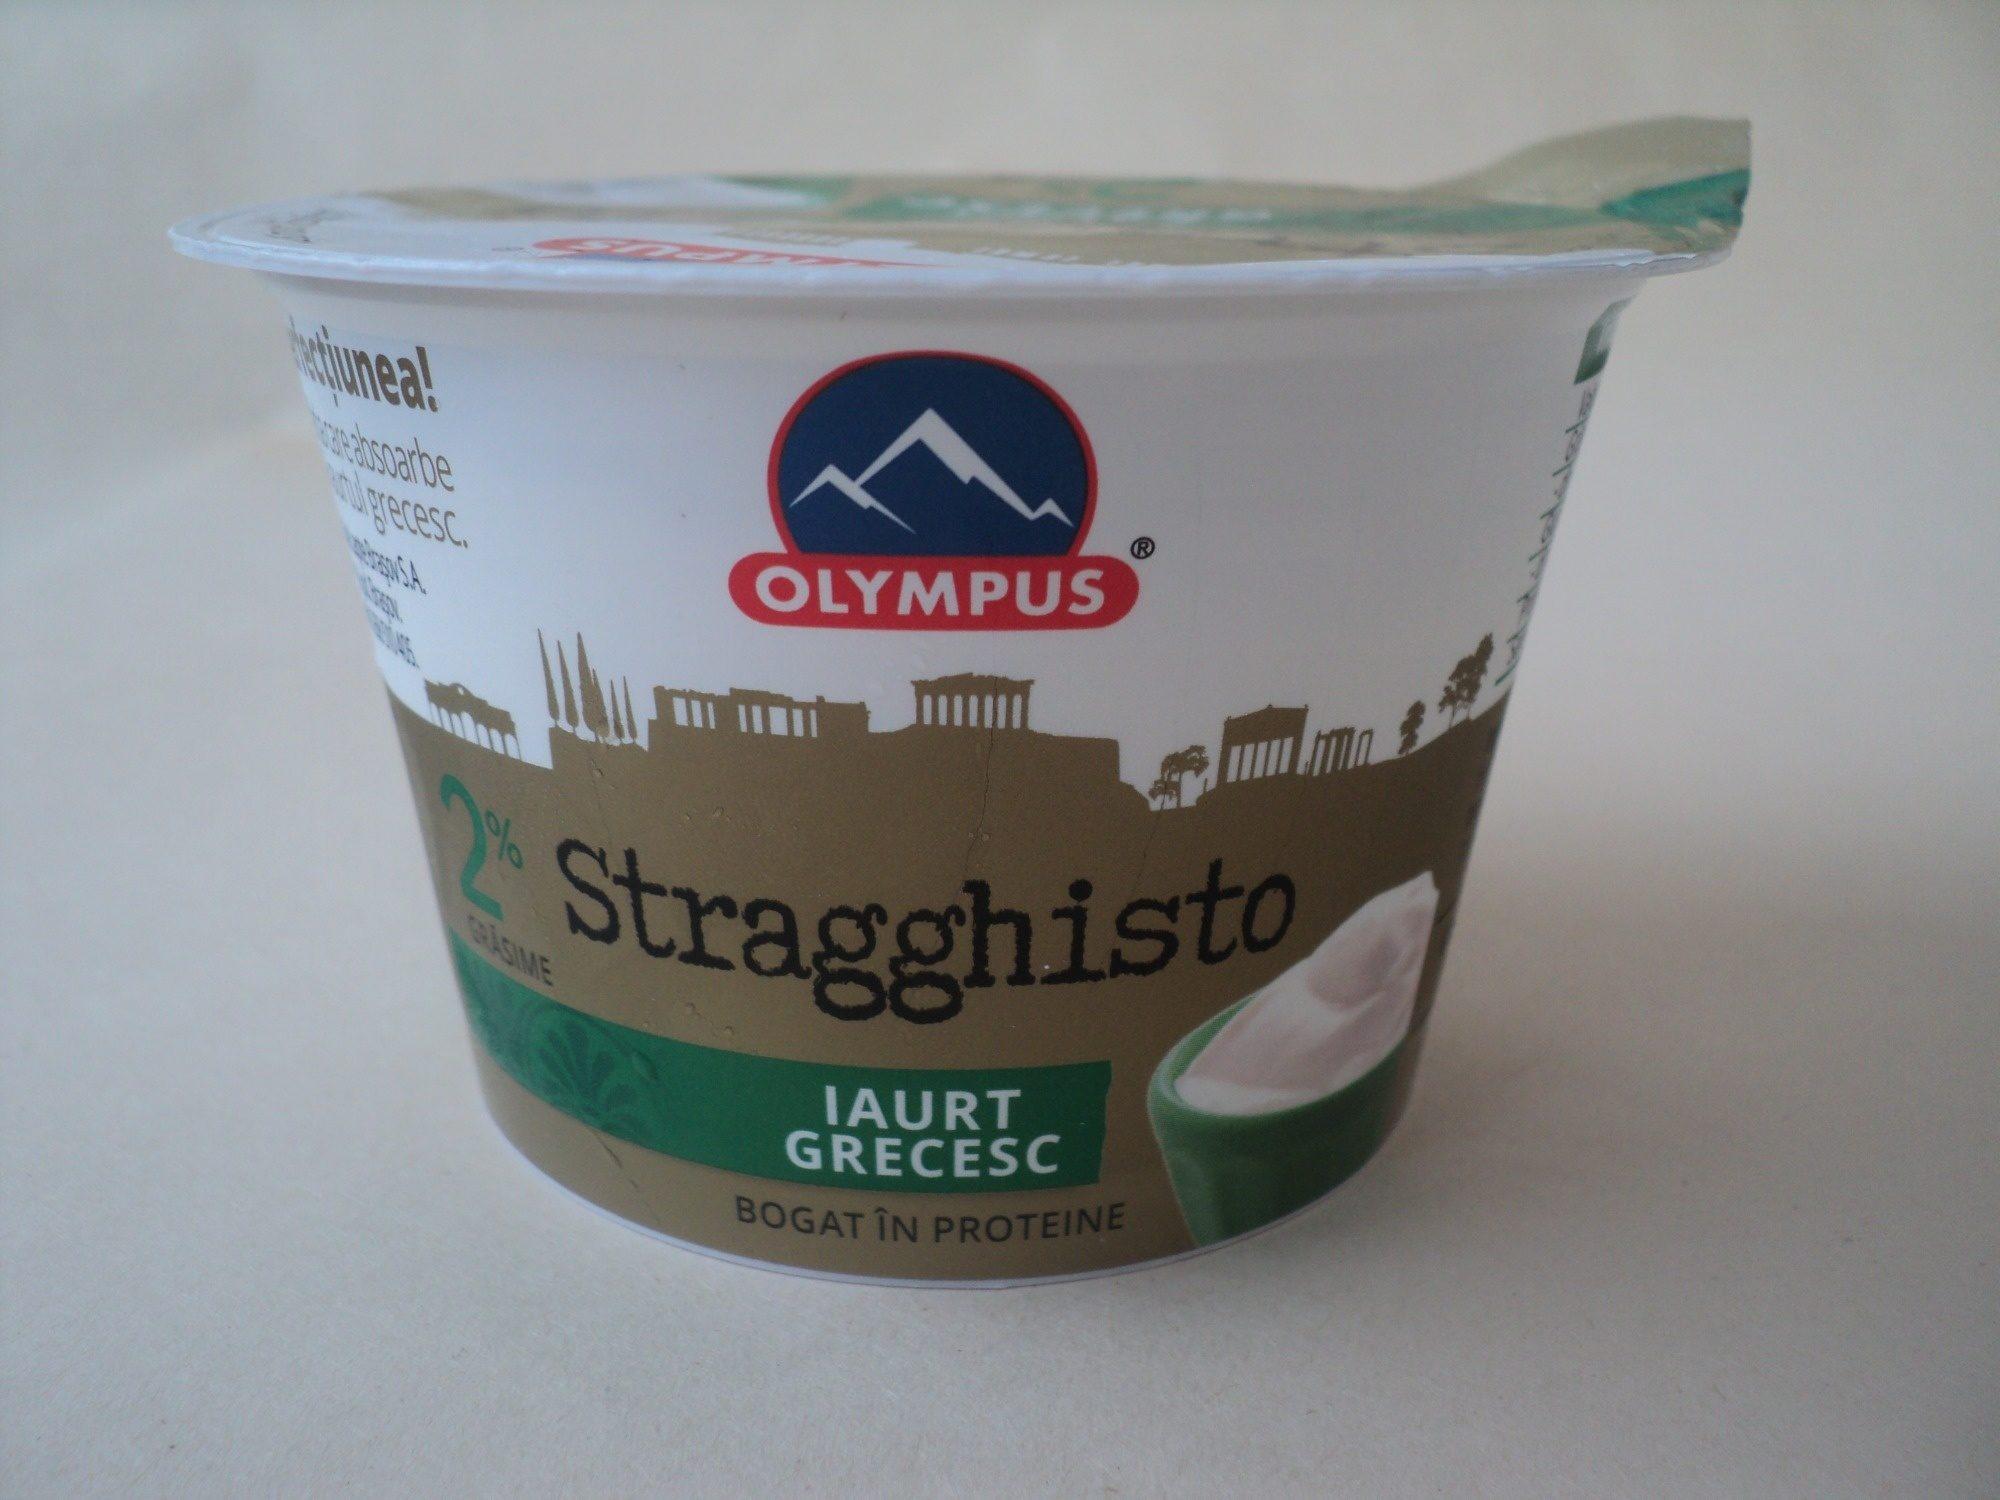 Olympus Stragghisto Iaurt grecesc - Product - ro